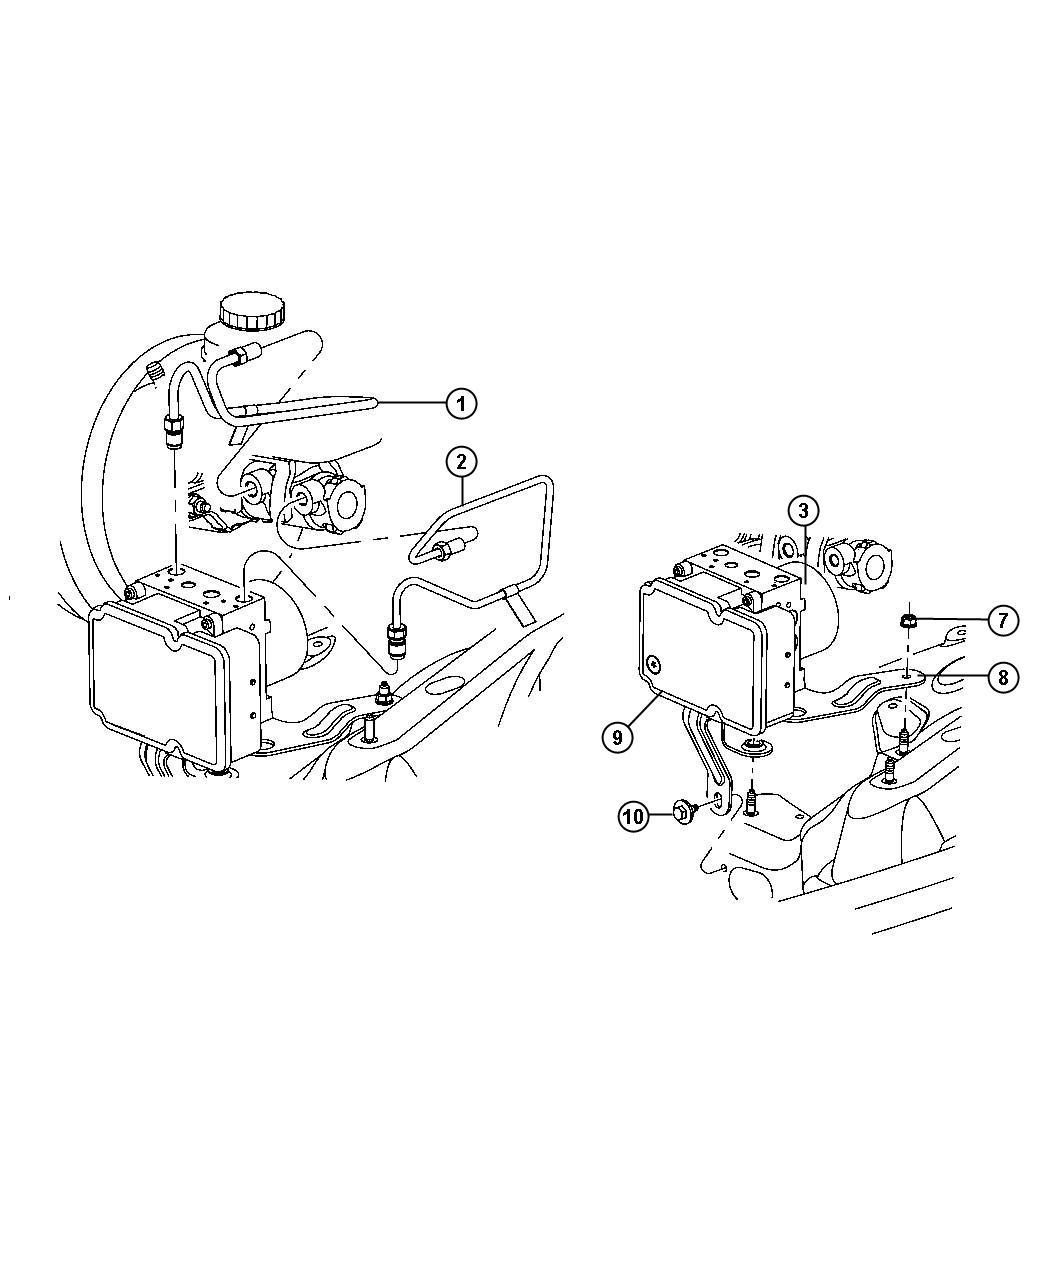 Dodge Nitro Module Anti Lock Brake System